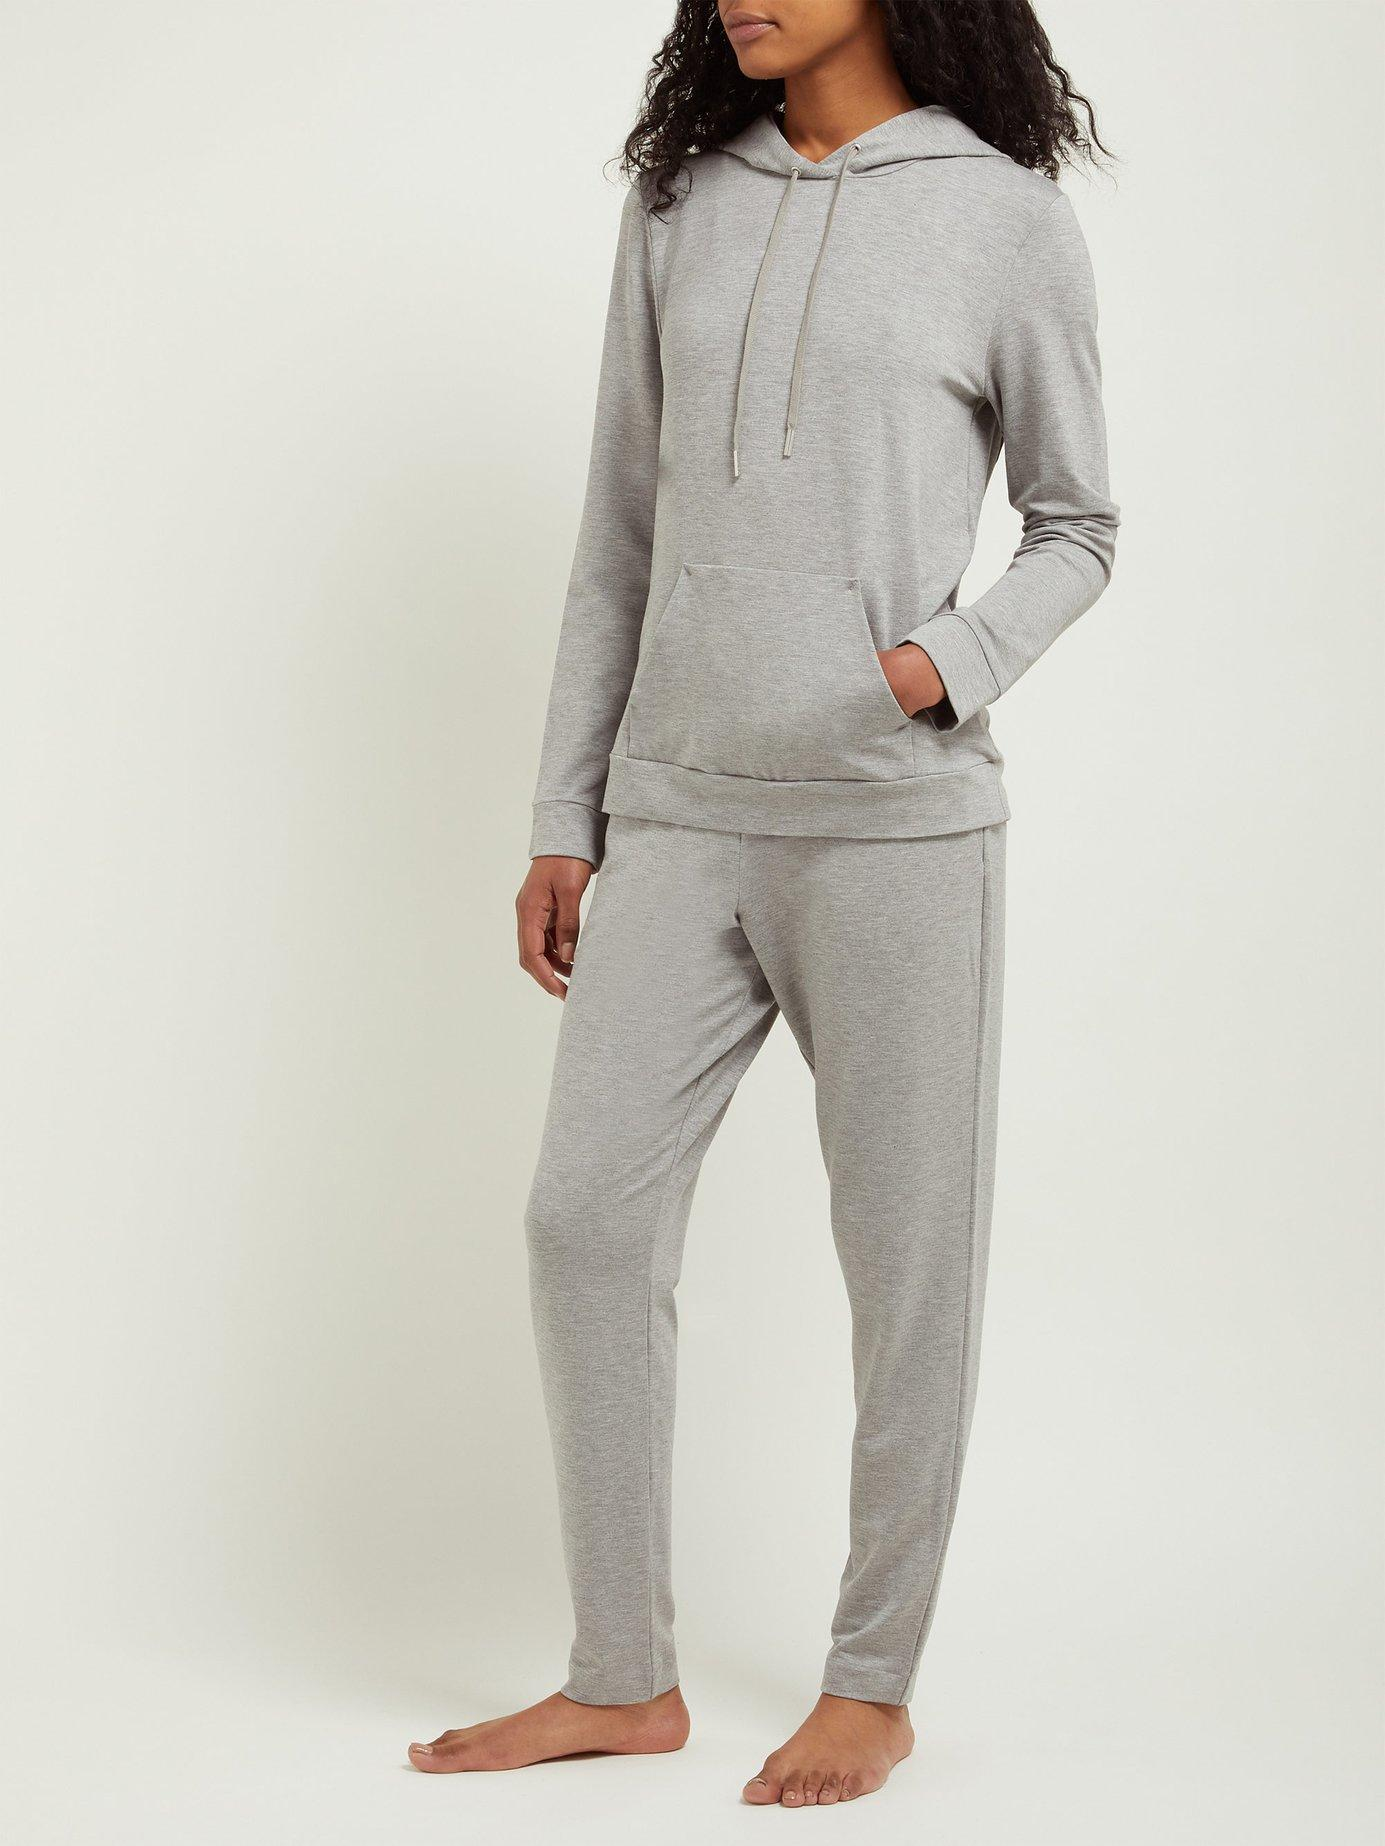 06d90fca688db Hanro Balance Hooded Pyjama Top in Gray - Lyst